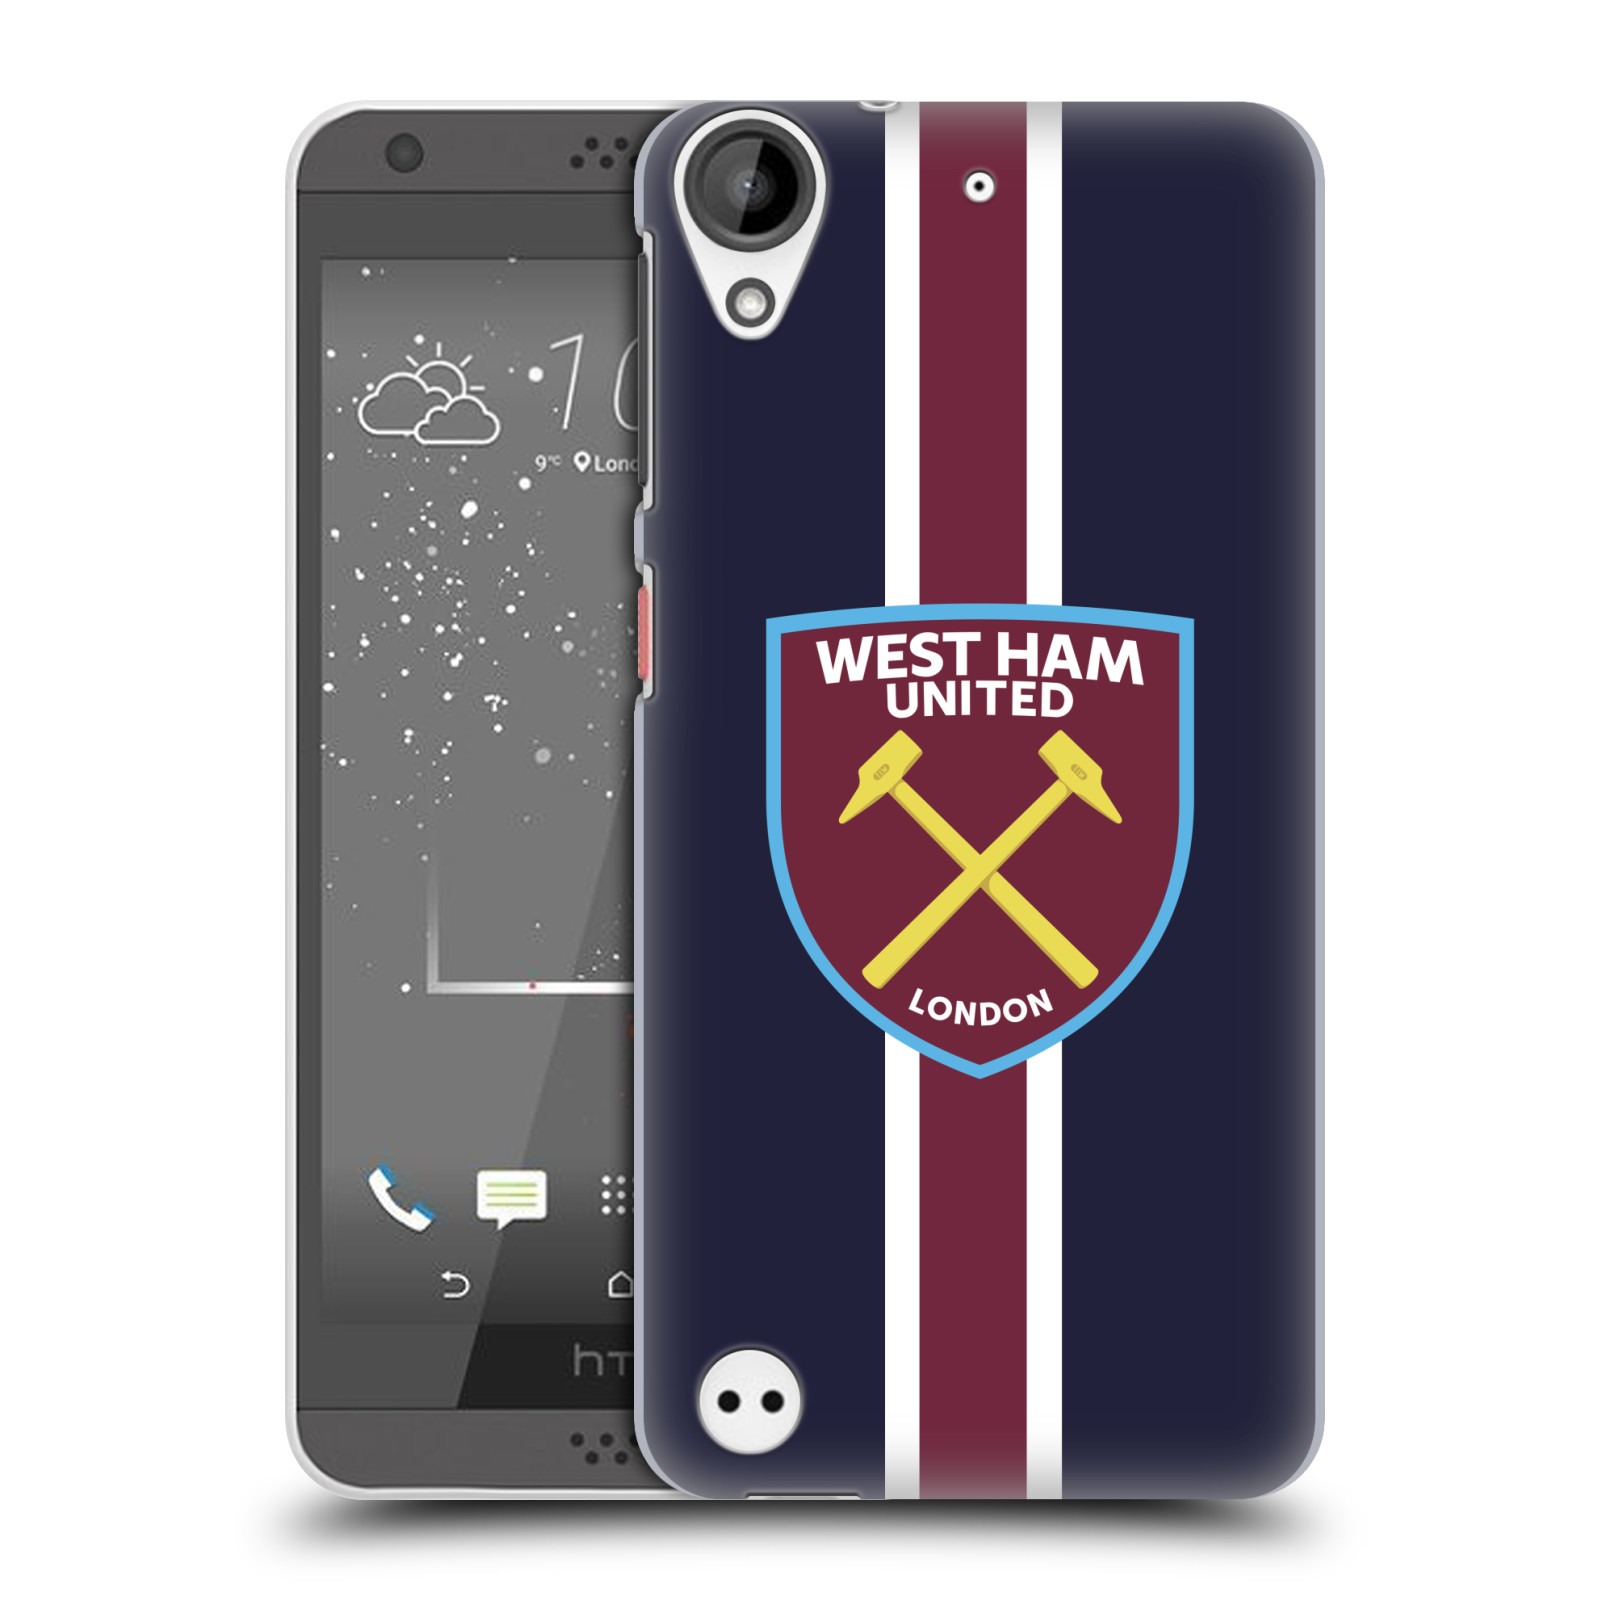 Plastové pouzdro na mobil HTC Desire 530 - Head Case - West Ham United - Pruhy